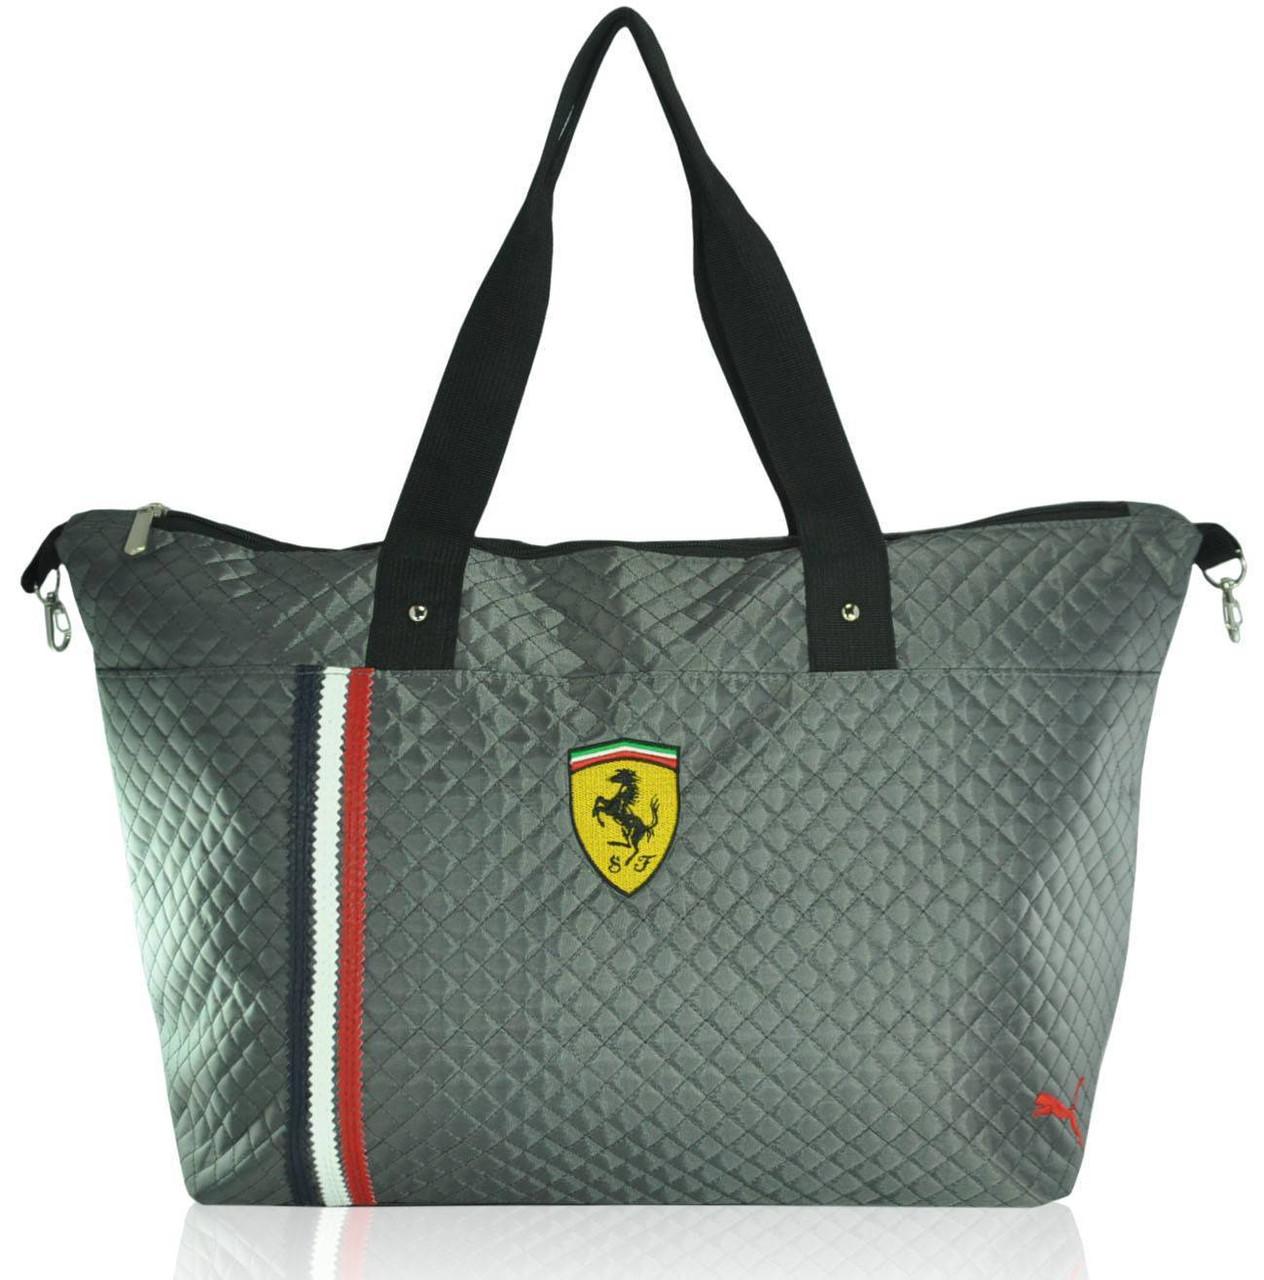 Спортивна стьобана сумка Puma Trapeze сіра репліка